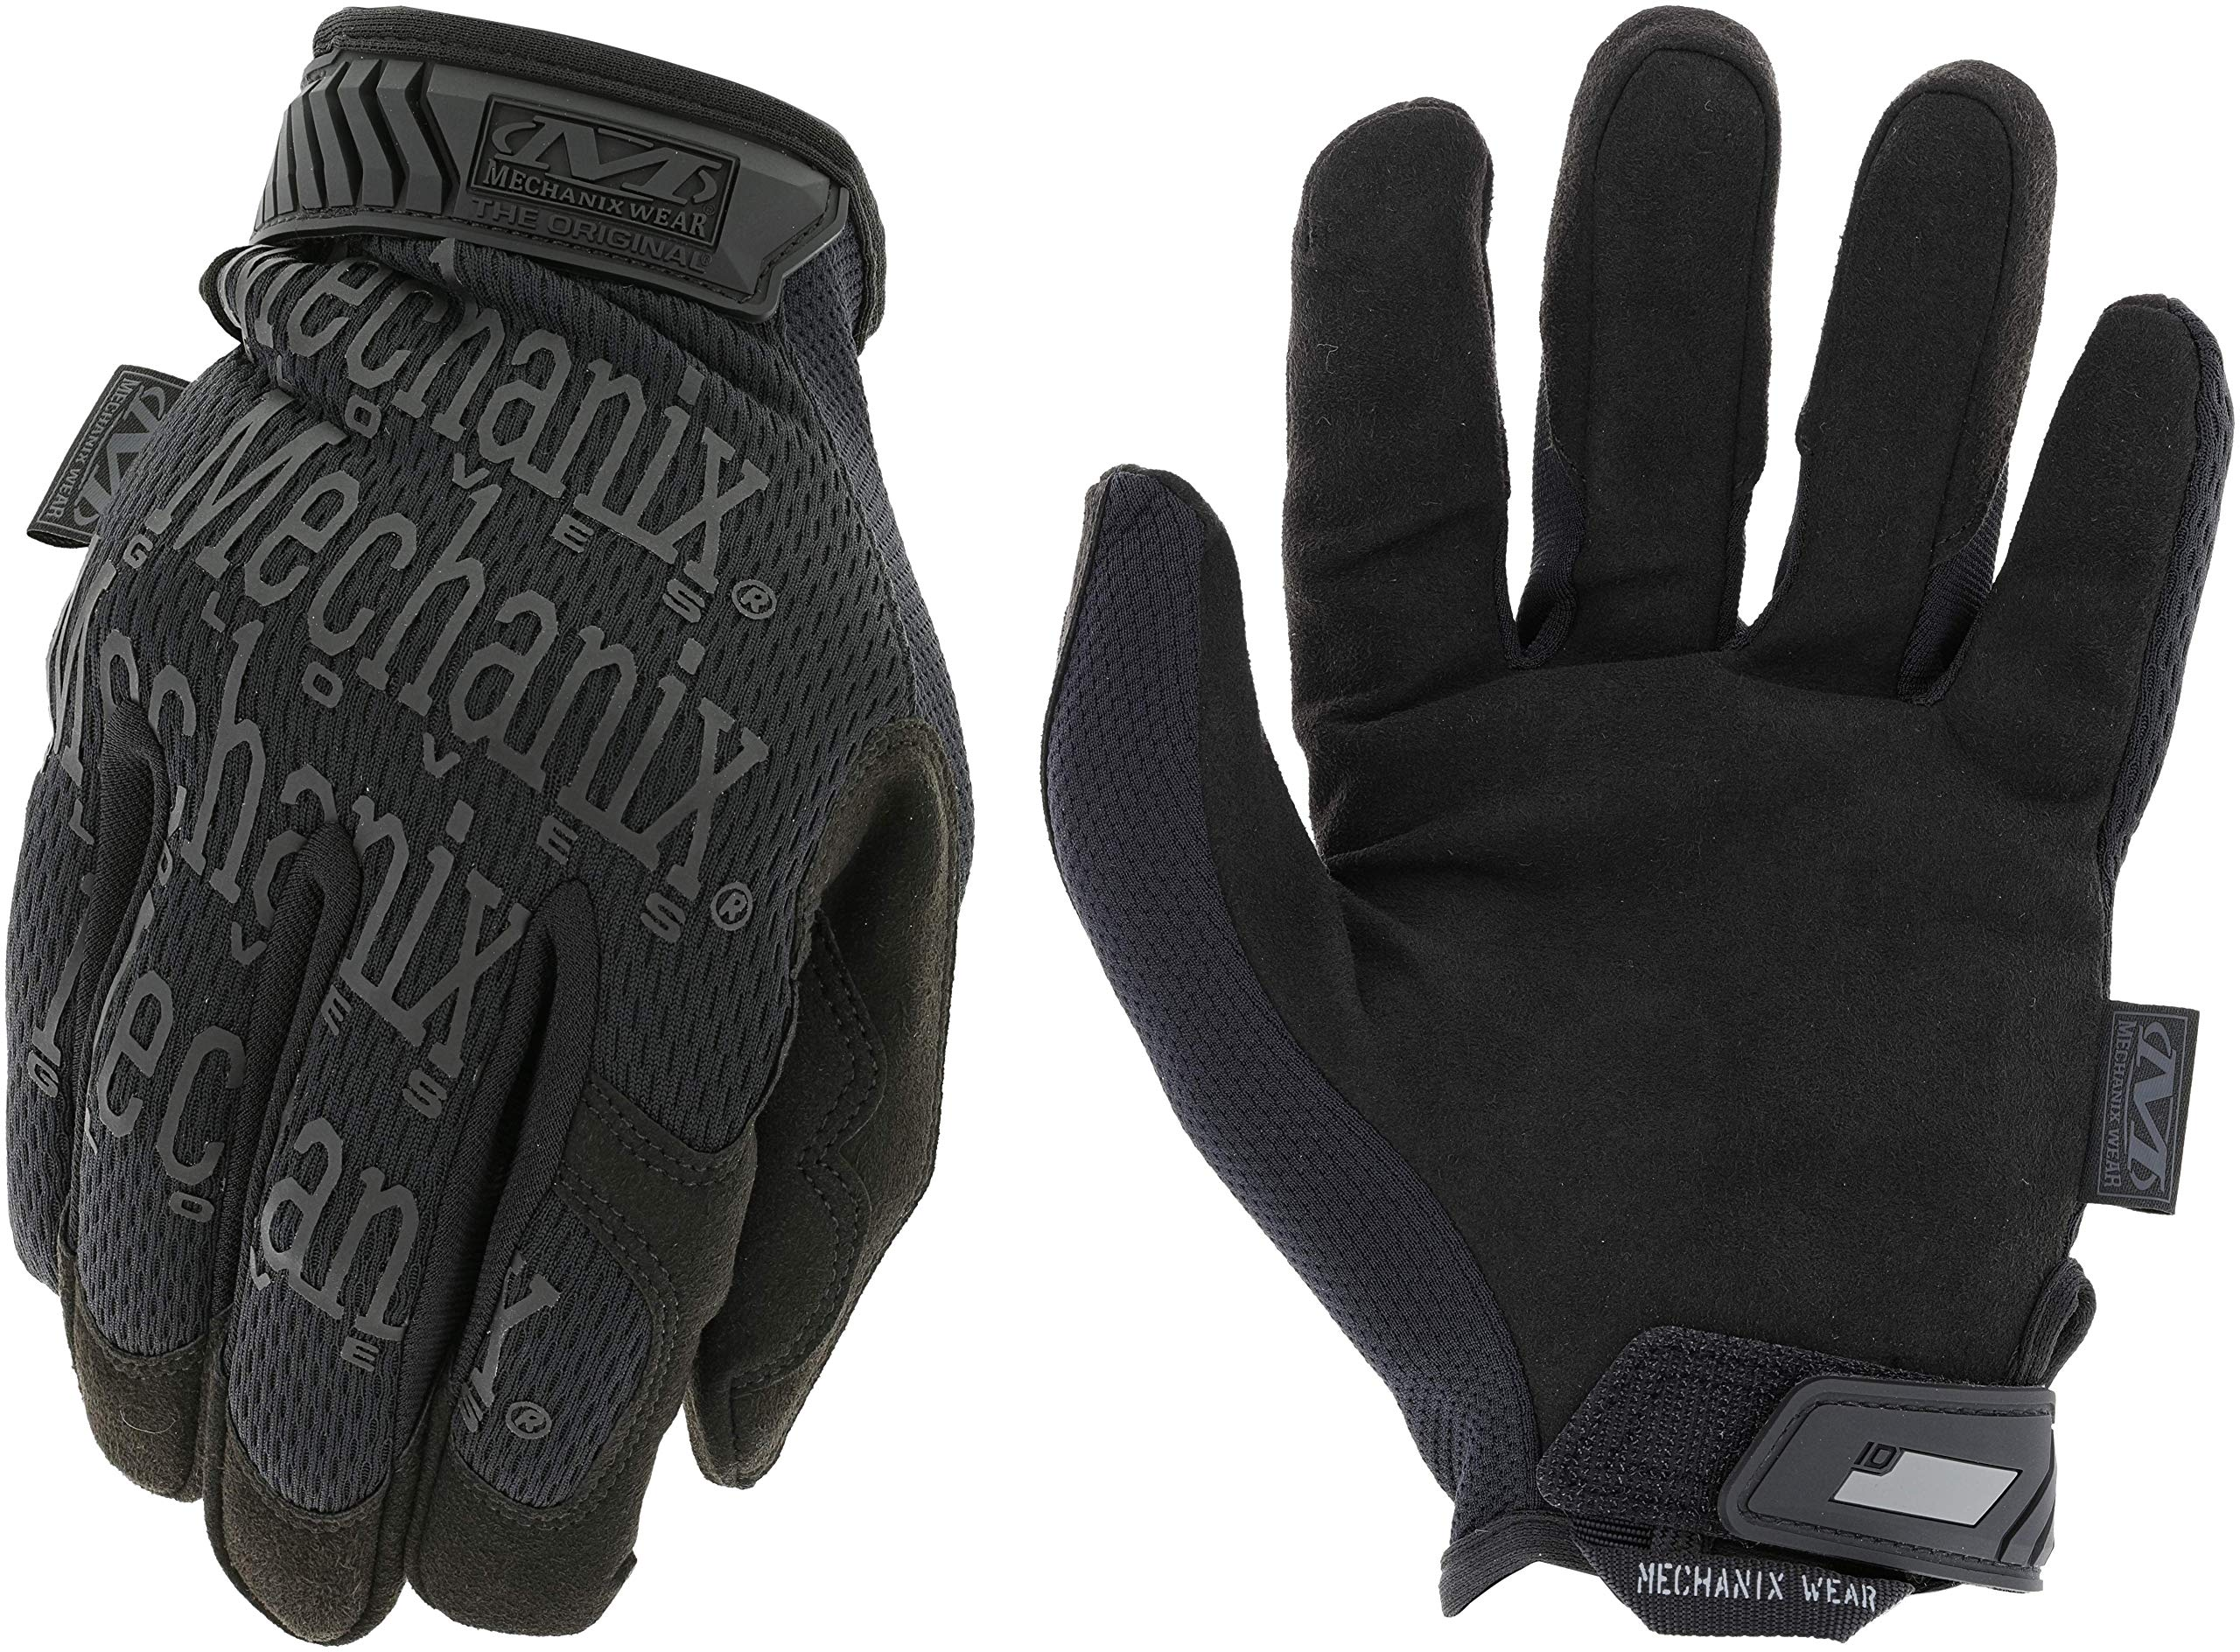 Mechanix Wear: The Original Covert Tactical Work Gloves (Large, All Black)